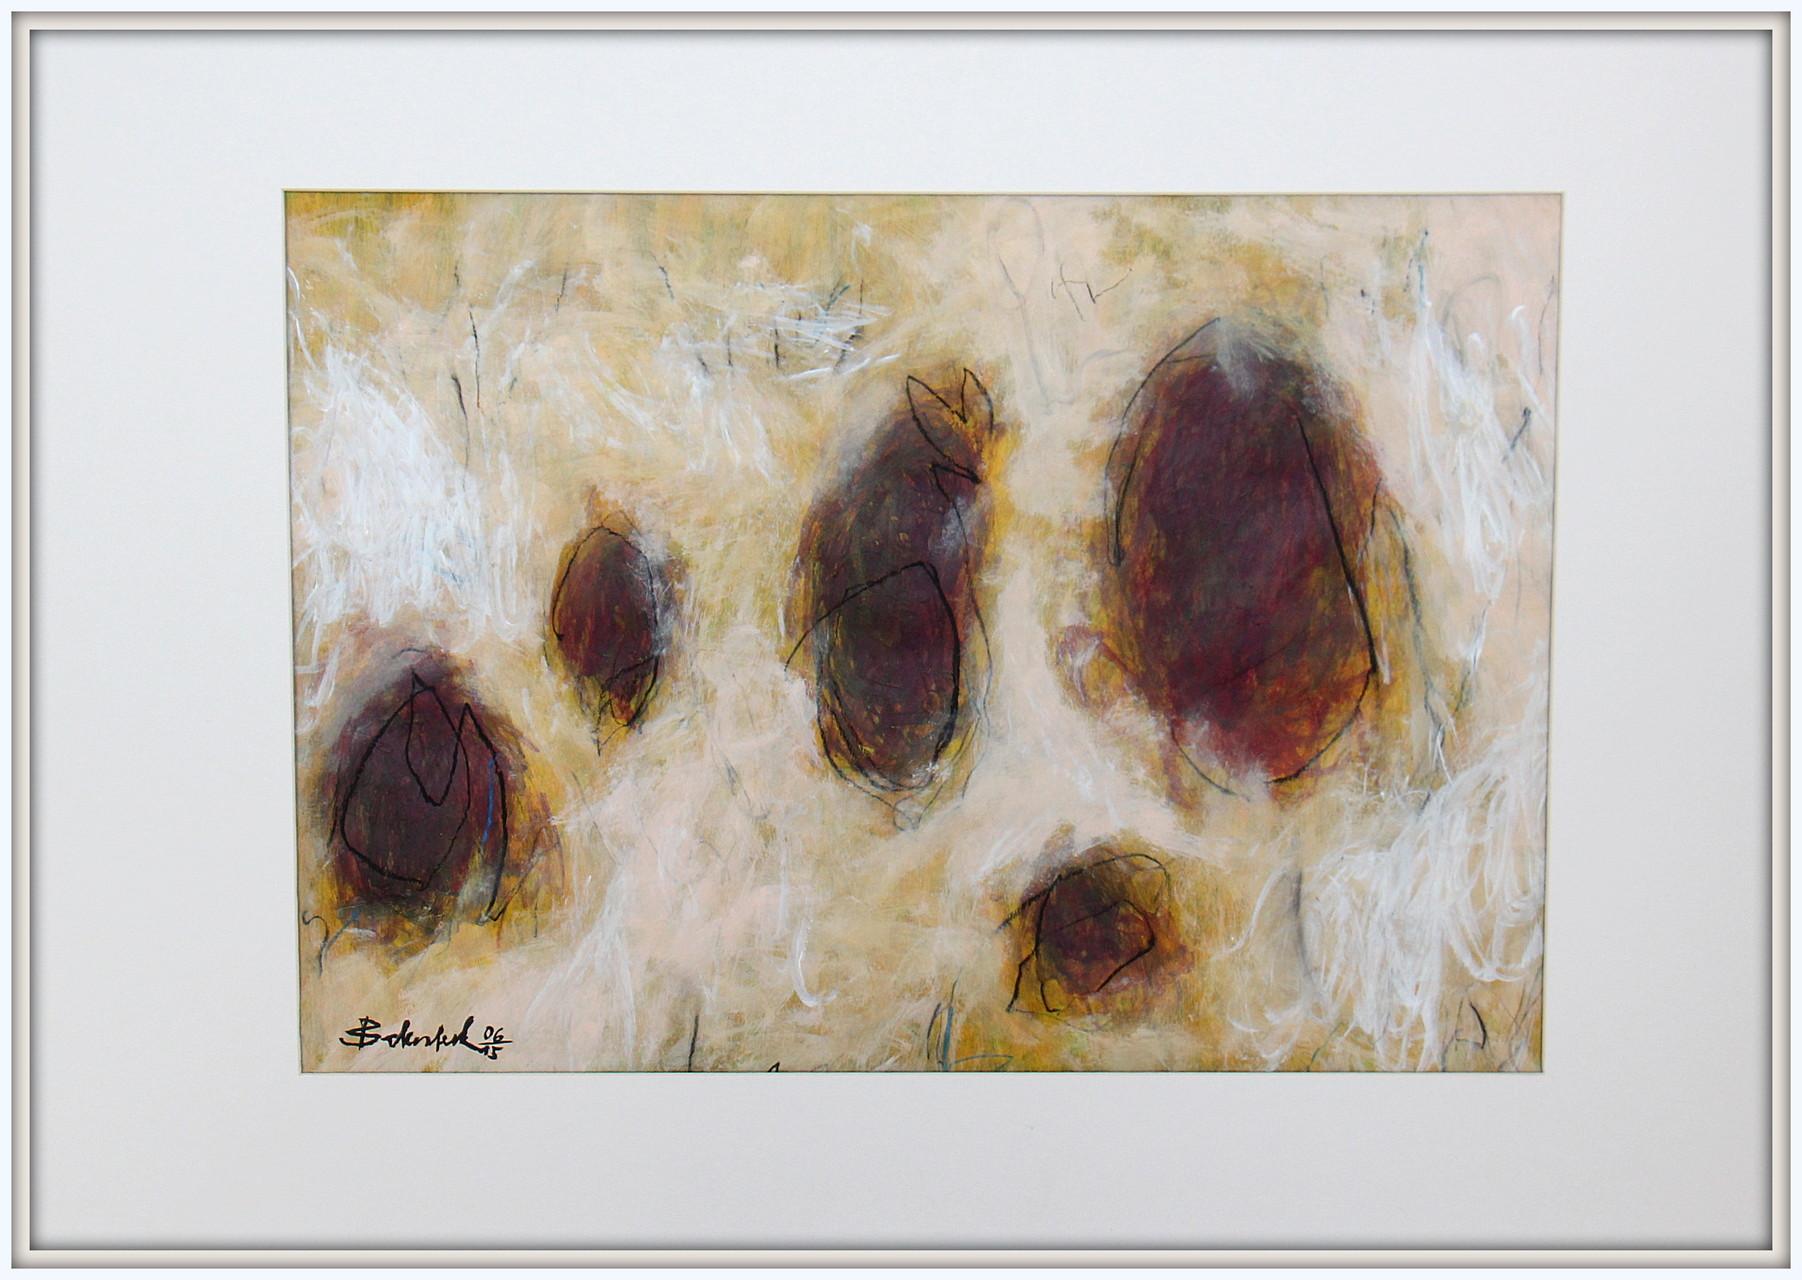 Terra Nr.12 / 50 x 70  Acryl, Lack, Ölkreide auf Papier